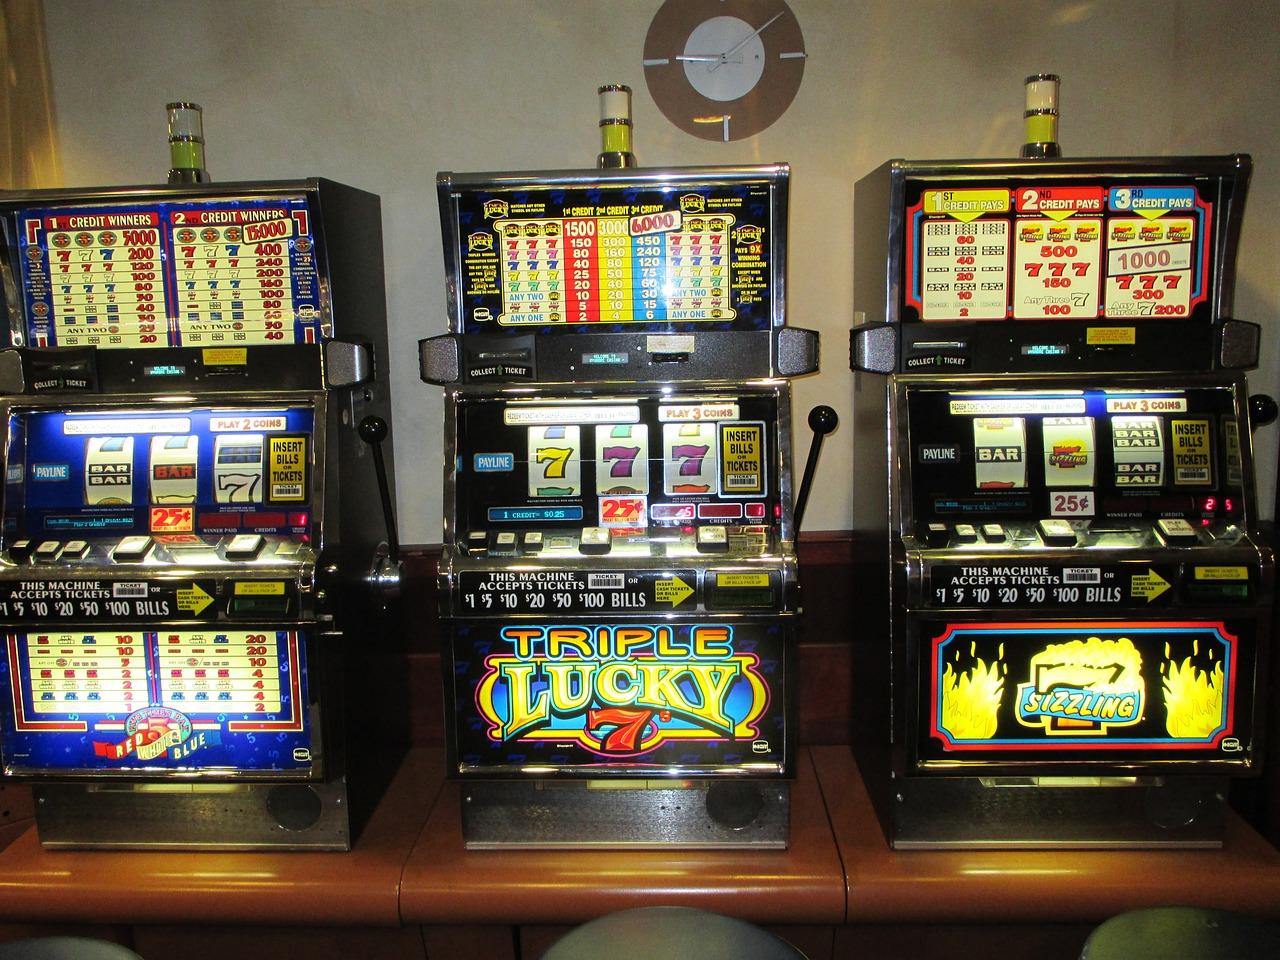 Spielautomaten Gaststätten - 69119